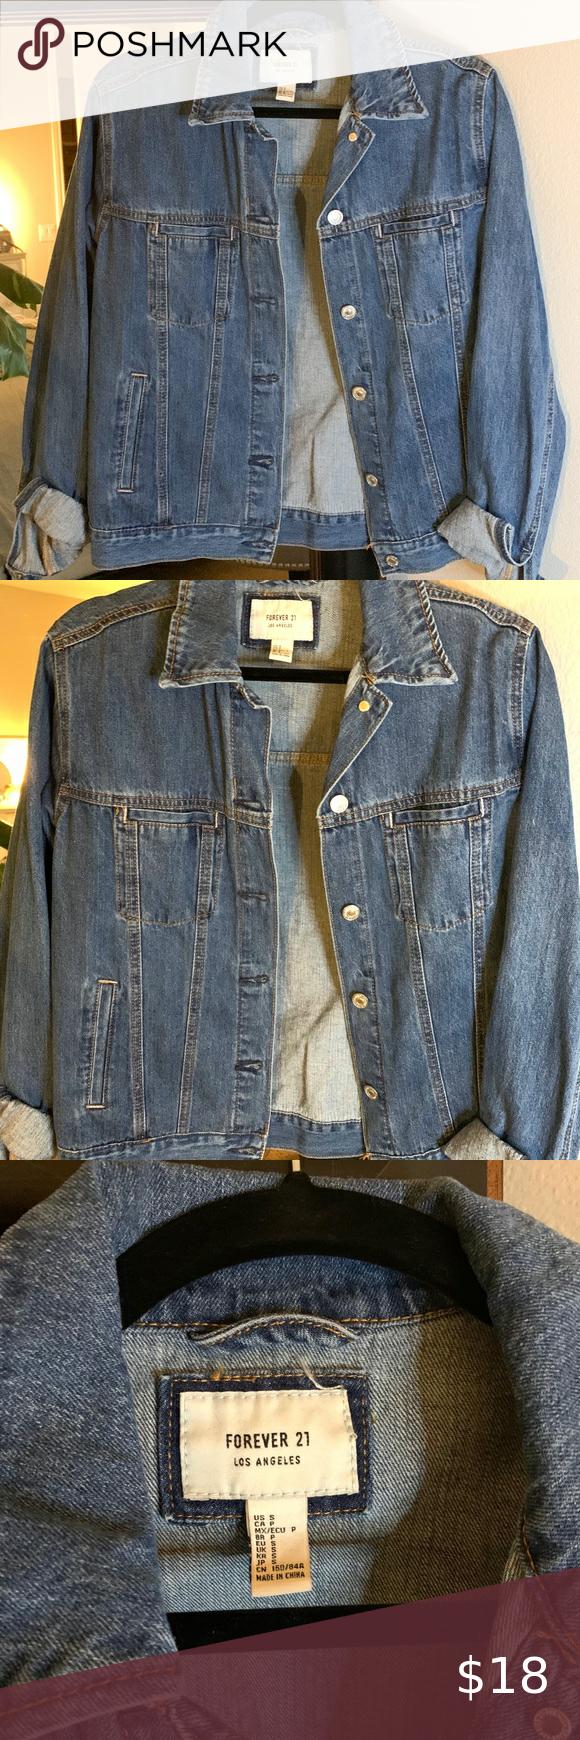 Forever 21 Jean Jacket In 2020 Dark Wash Denim Jacket Jean Jacket Forever 21 Jacket Coats [ 1740 x 580 Pixel ]